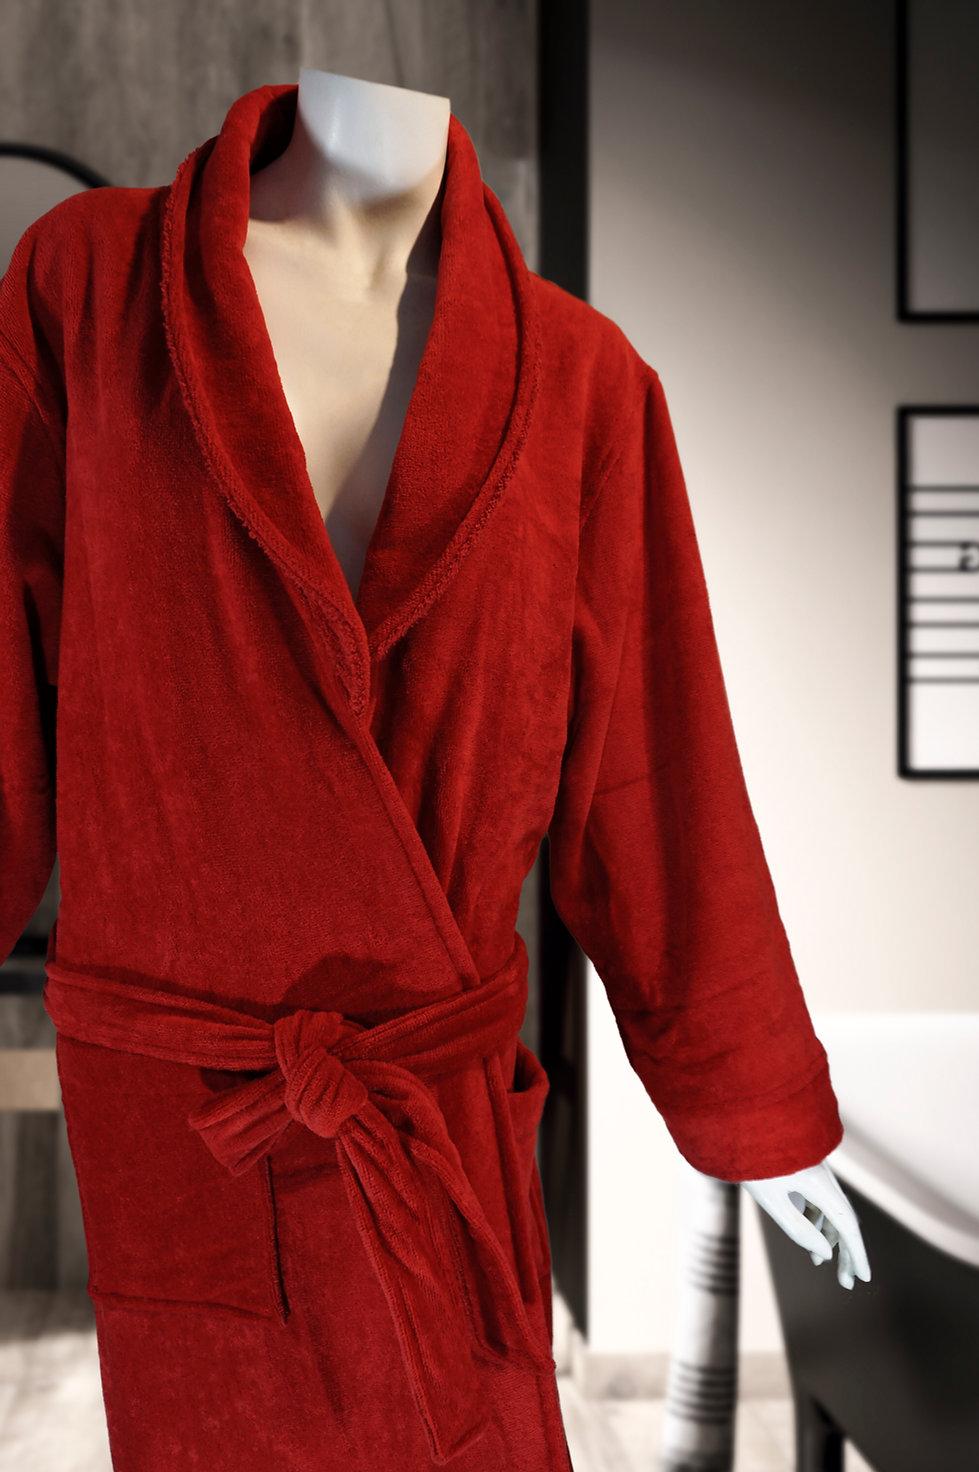 bathrobe.jpg